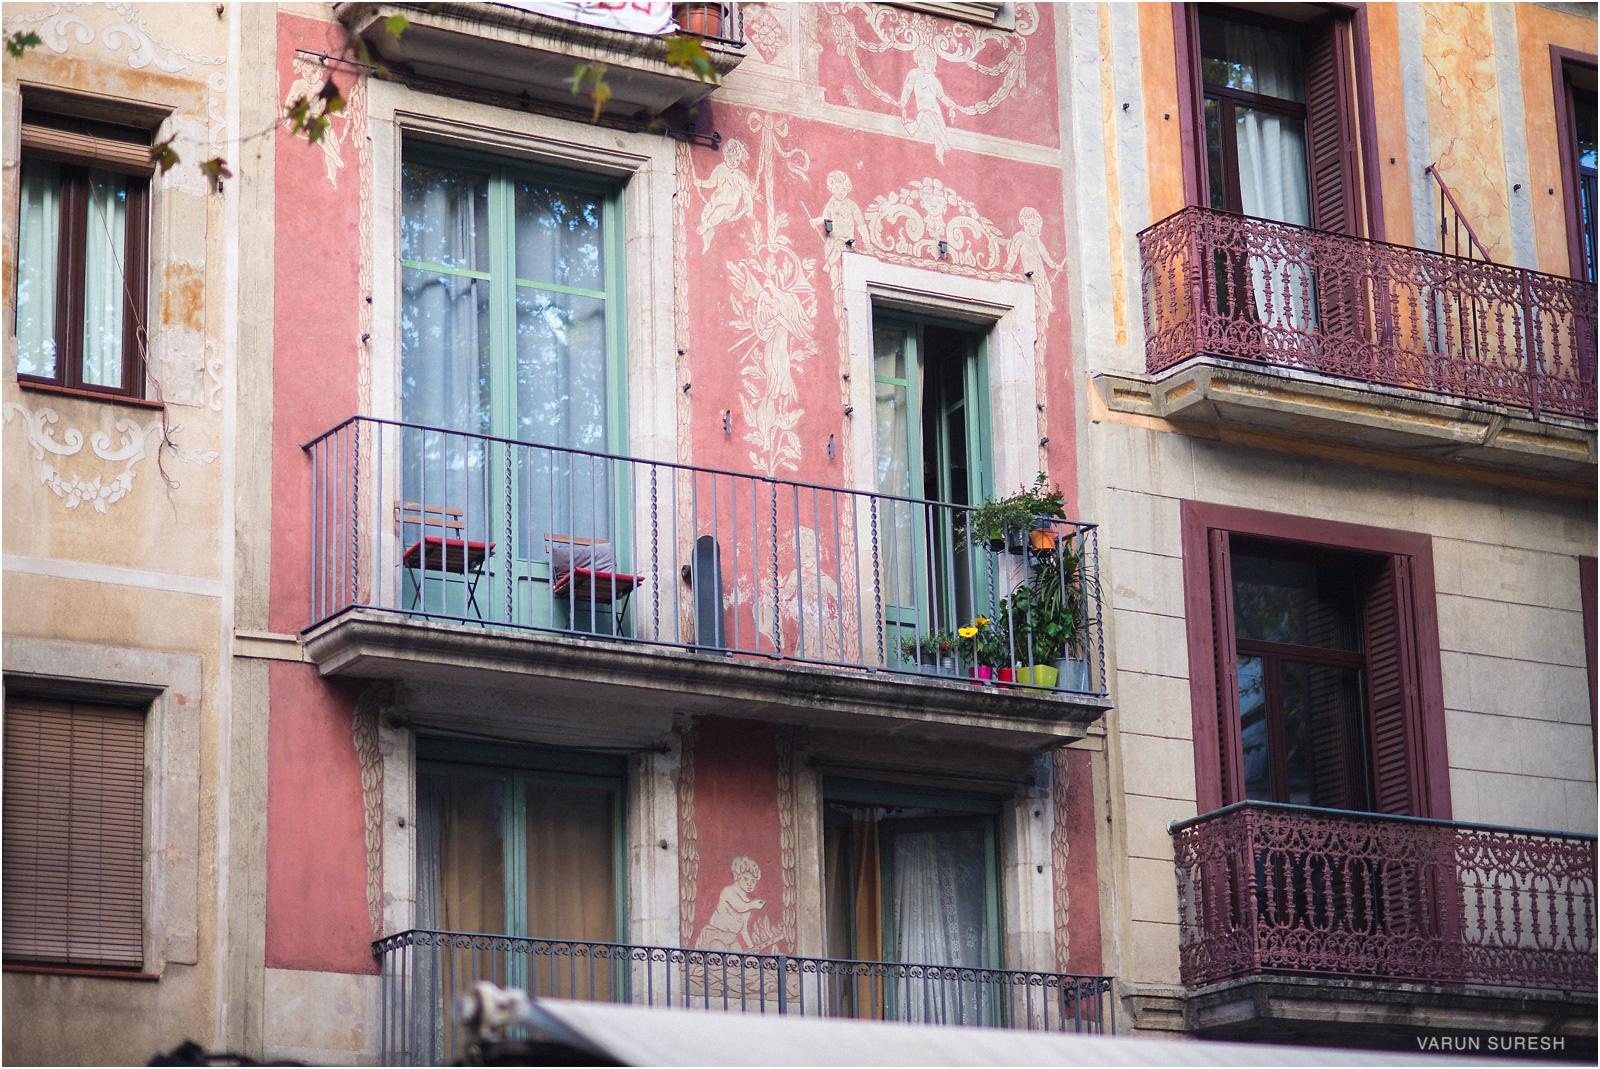 Spain_Portugal_2015_113_Blog.jpg